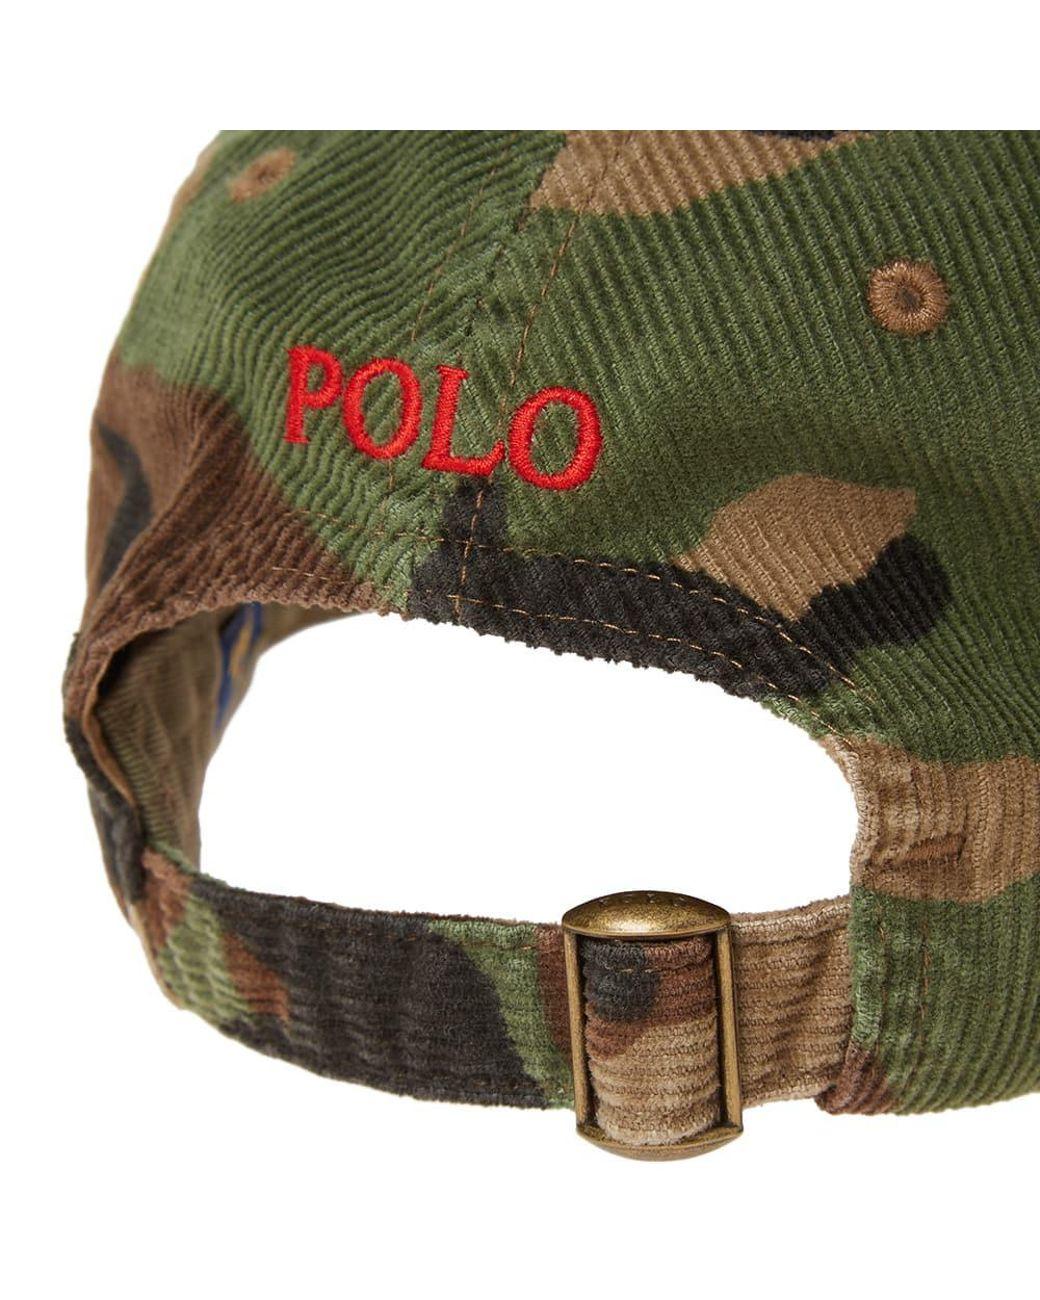 ad24e825c8843 Polo Ralph Lauren Corduroy Cap in Green for Men - Lyst